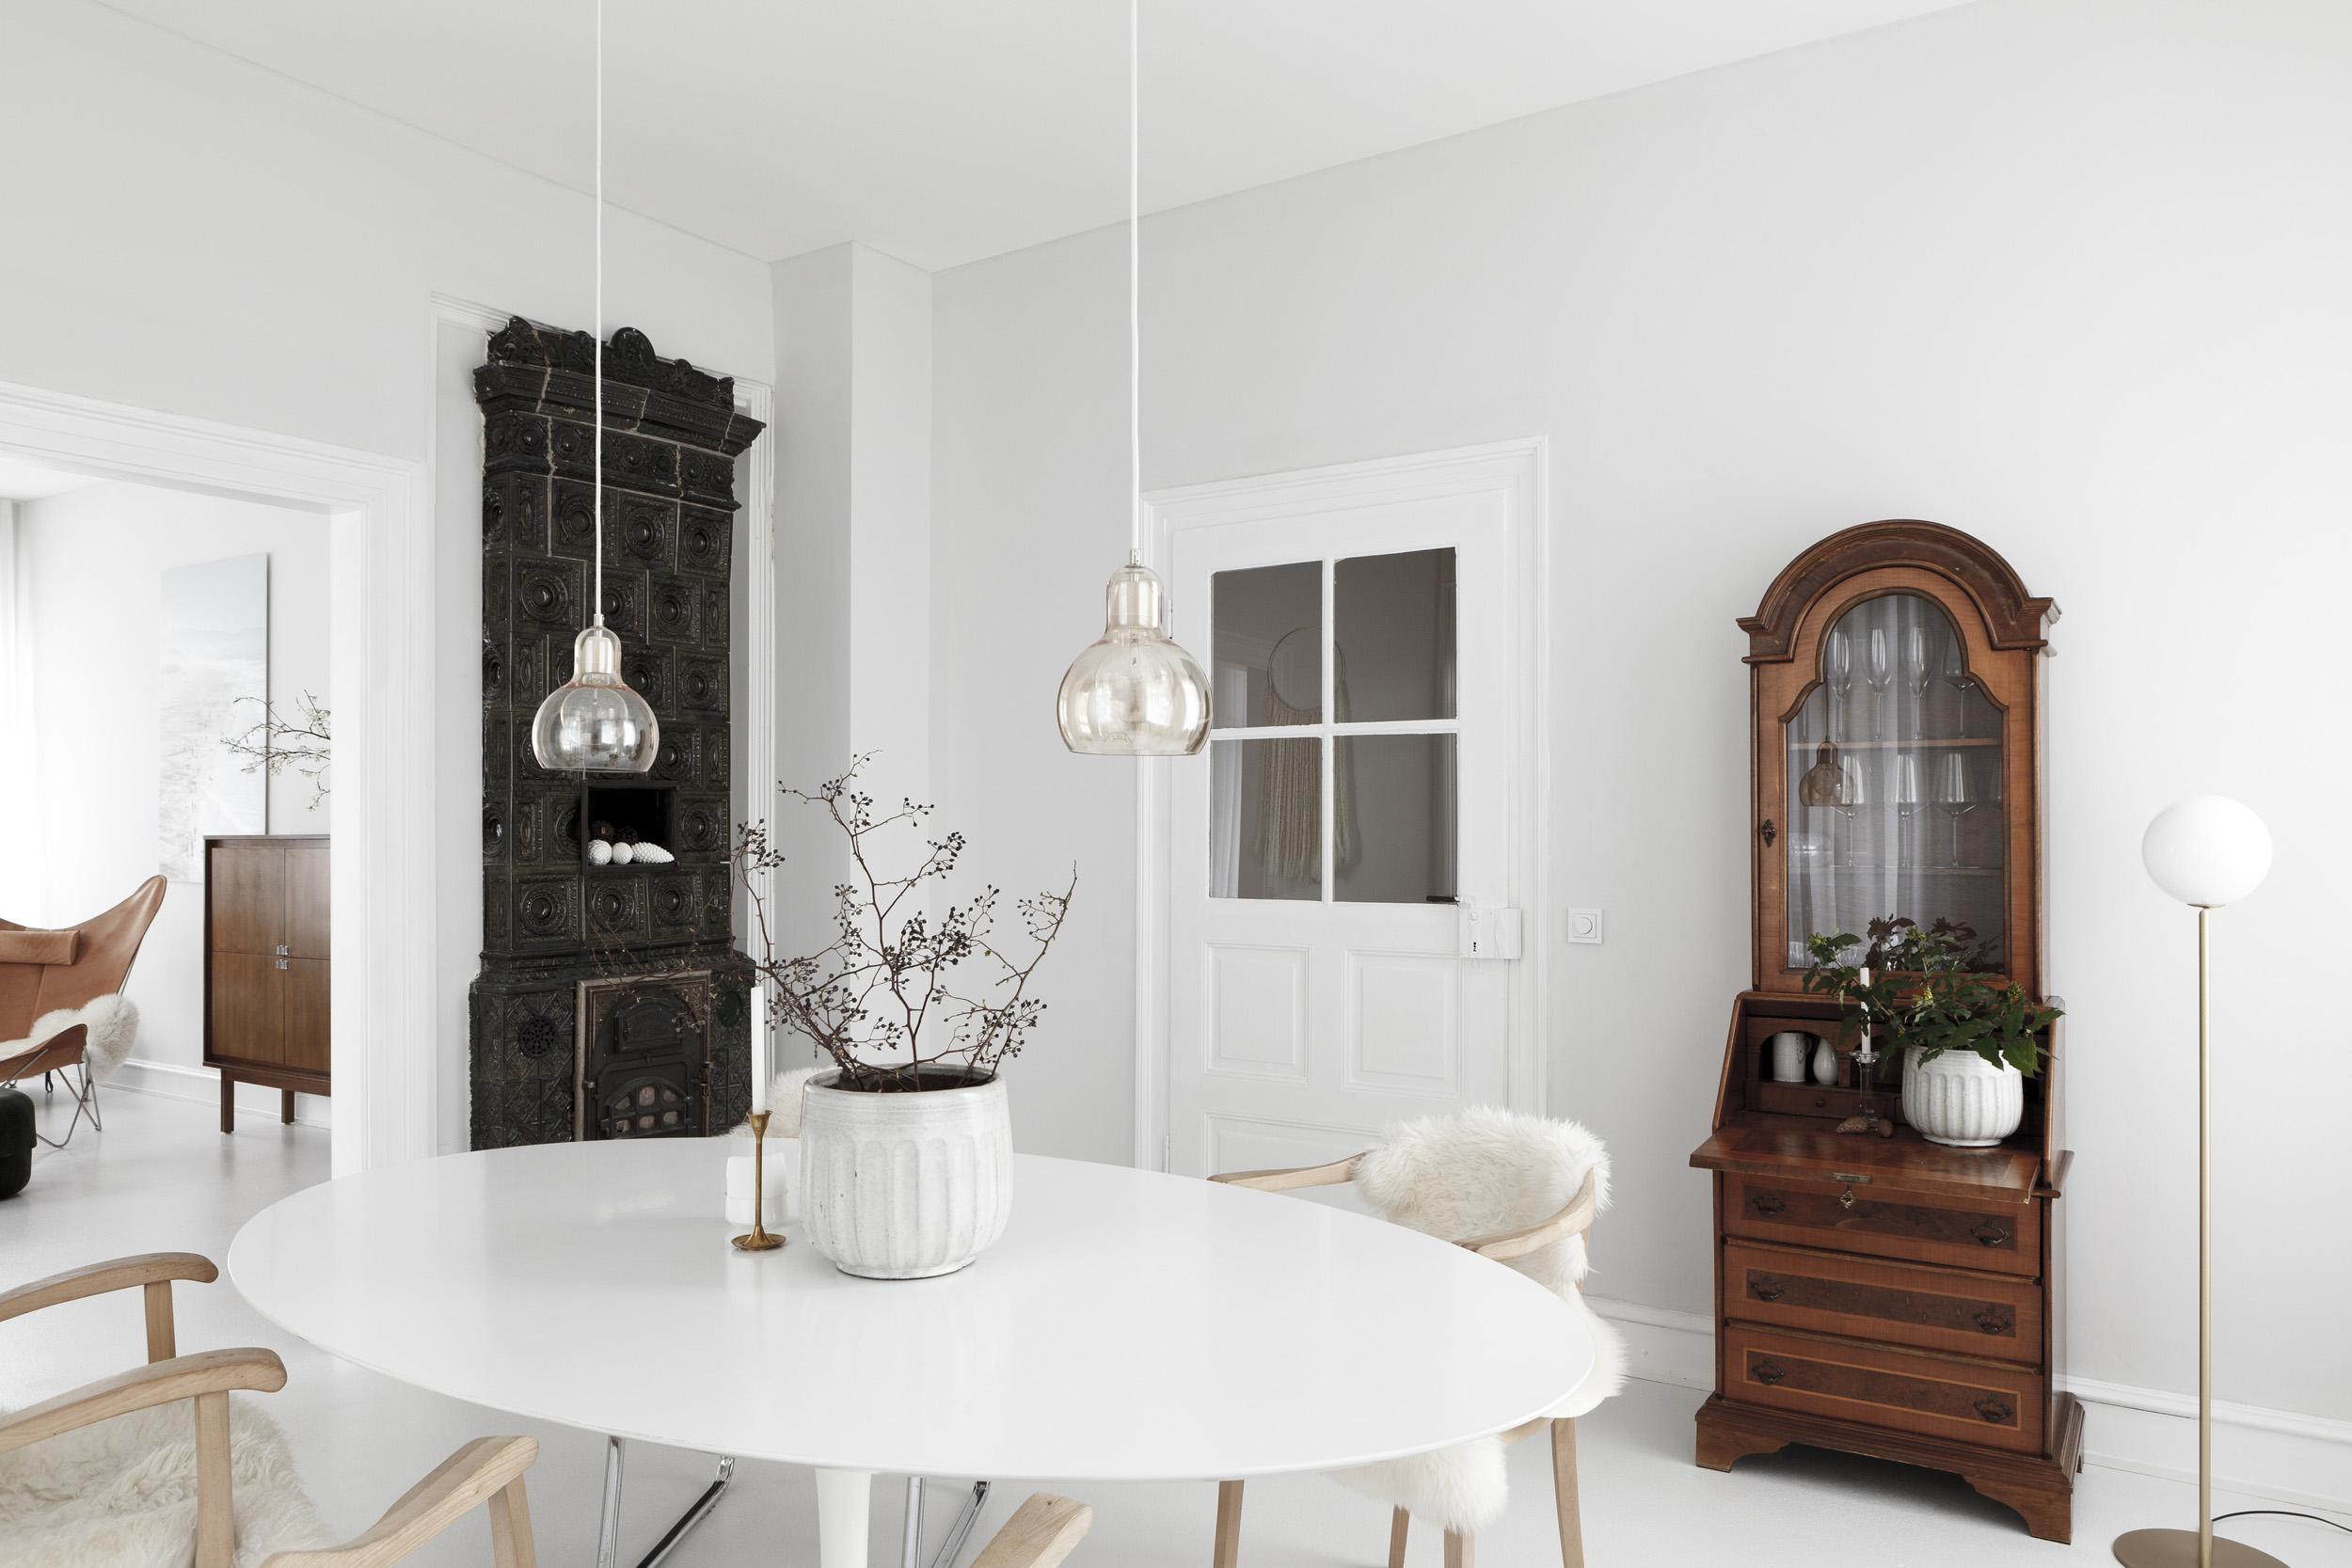 Studio-Oink-House-Cal-II-apartment-remodel-Mainz-Germany-Remodelista-1.jpg